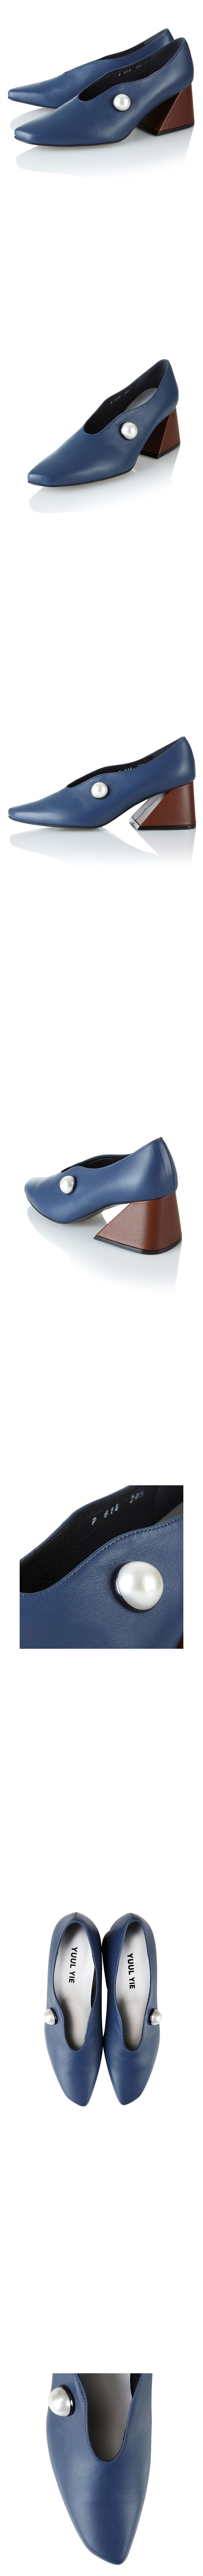 Yuul Yie Color : navy + brown  Material : cow skin  Heel height : 6cm